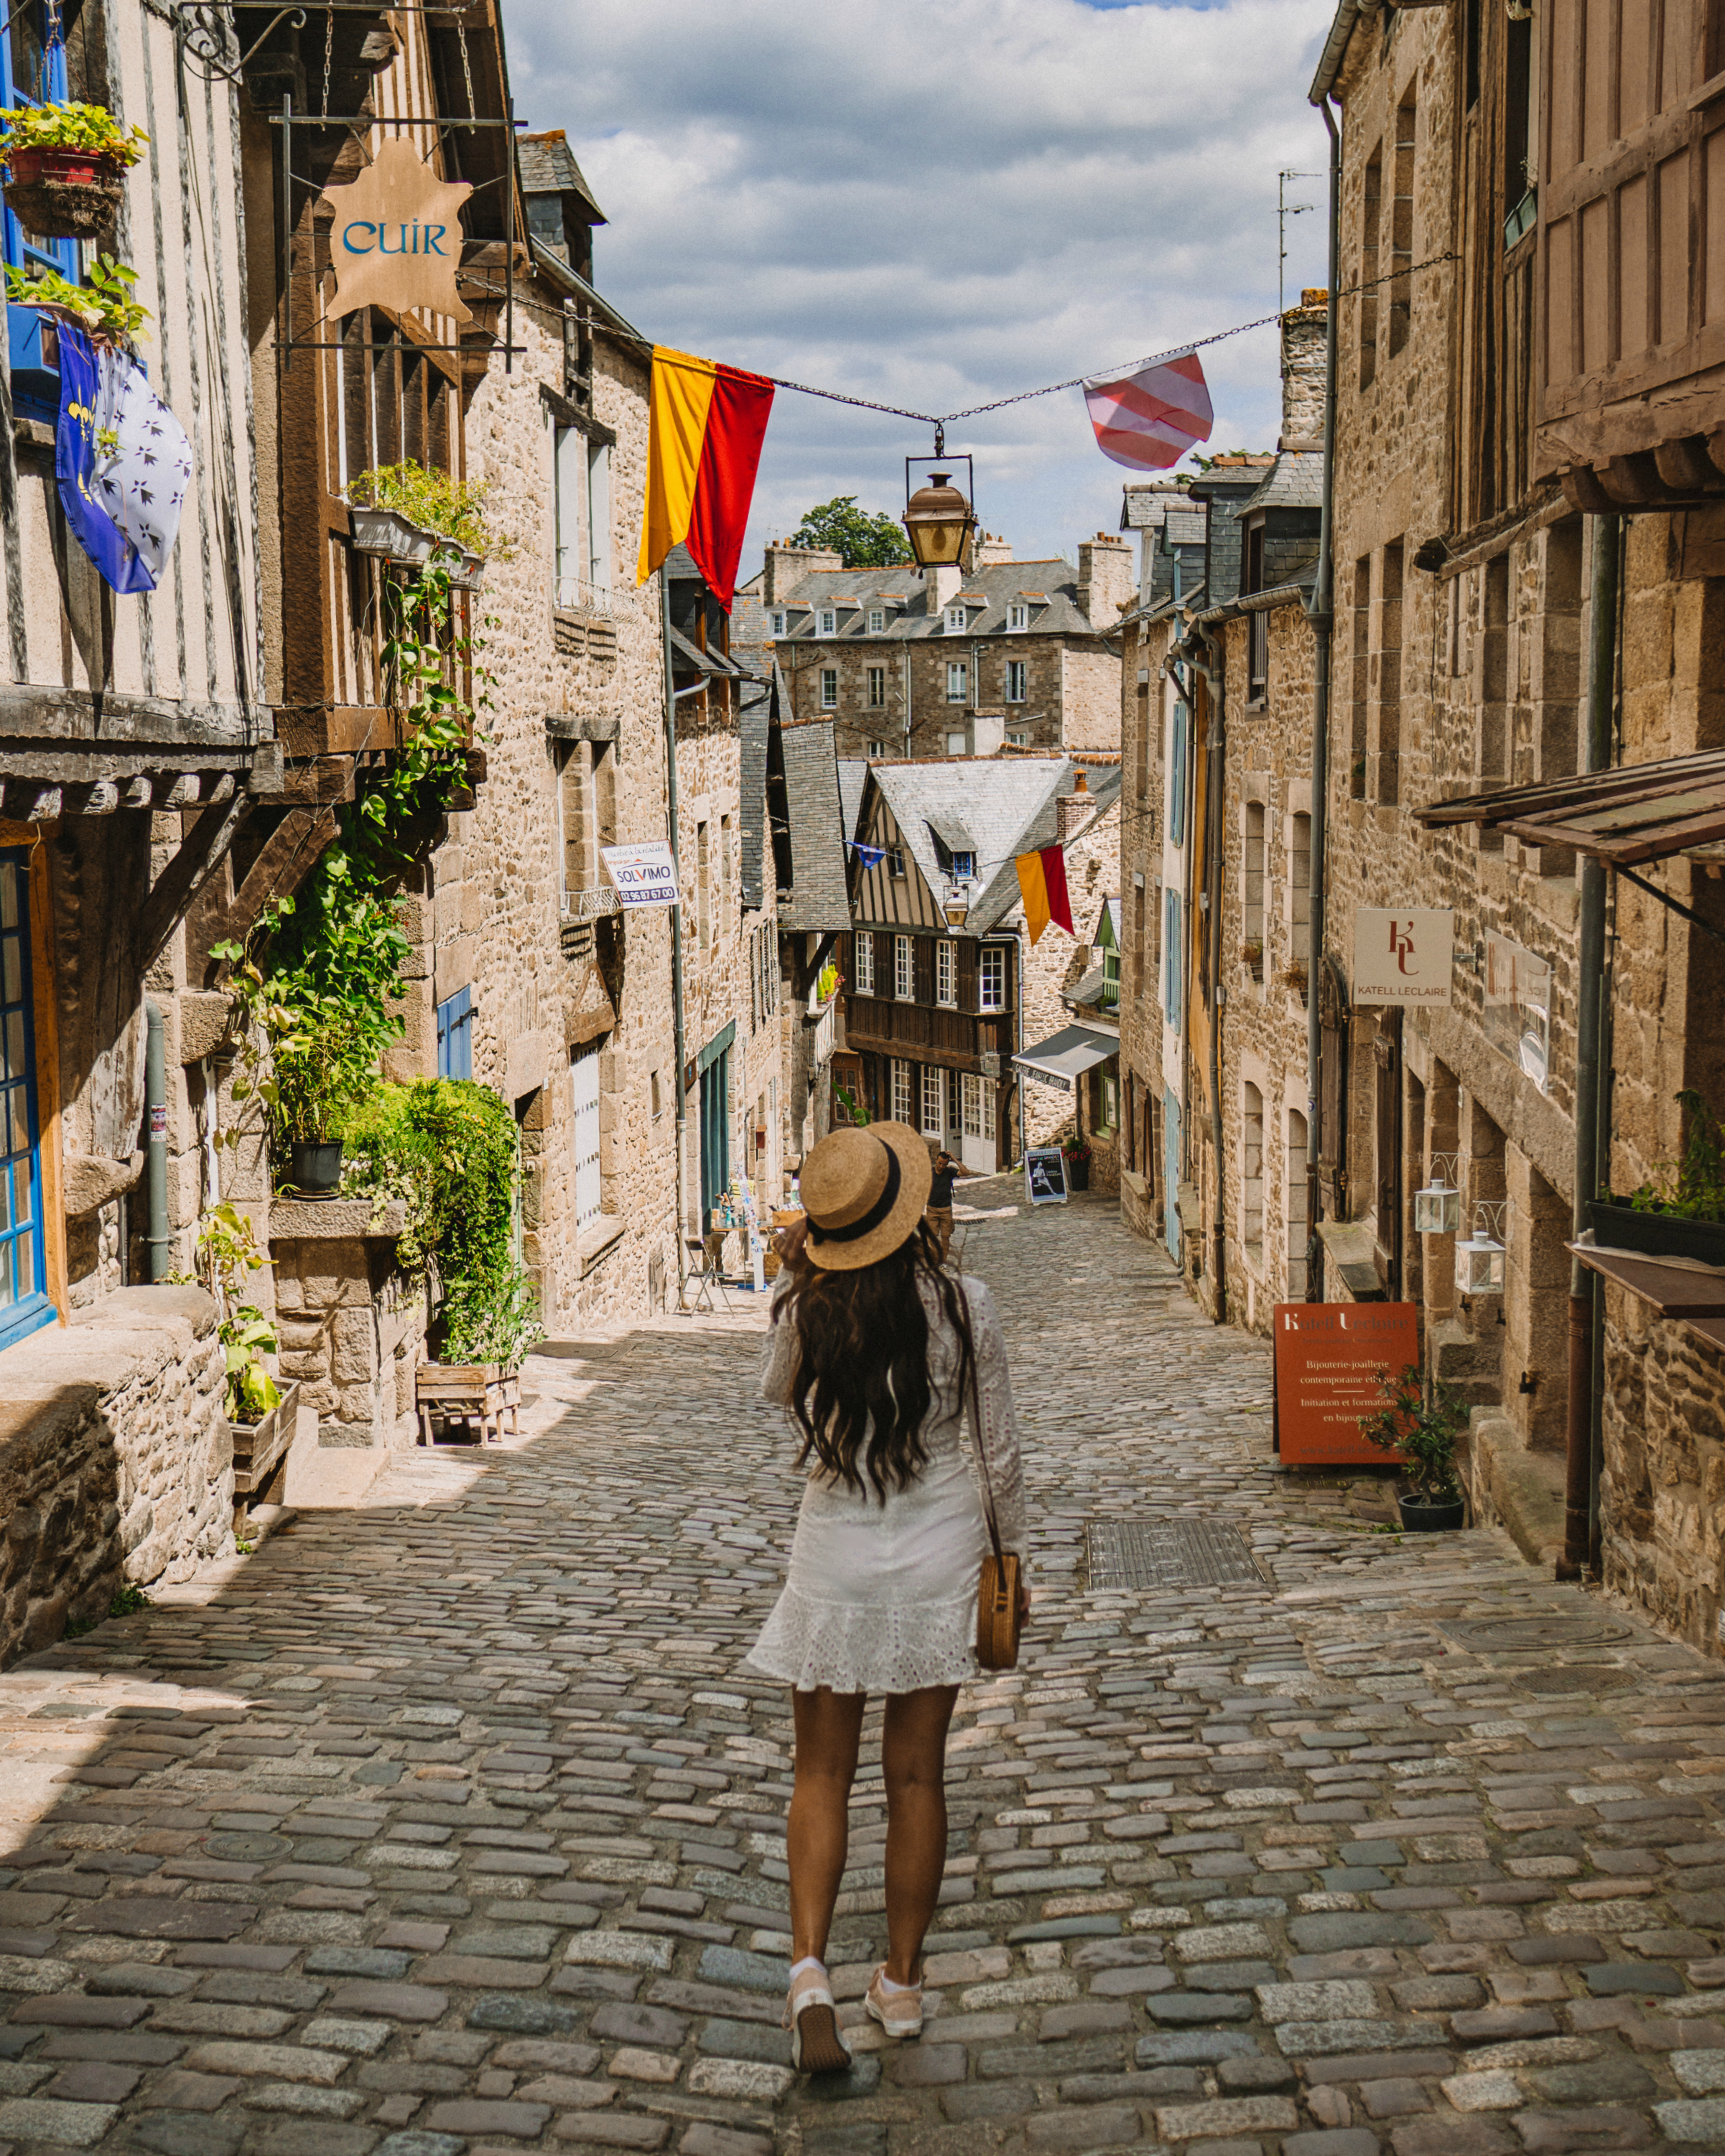 Walking down Rue du Petit Fort, Dinan, France